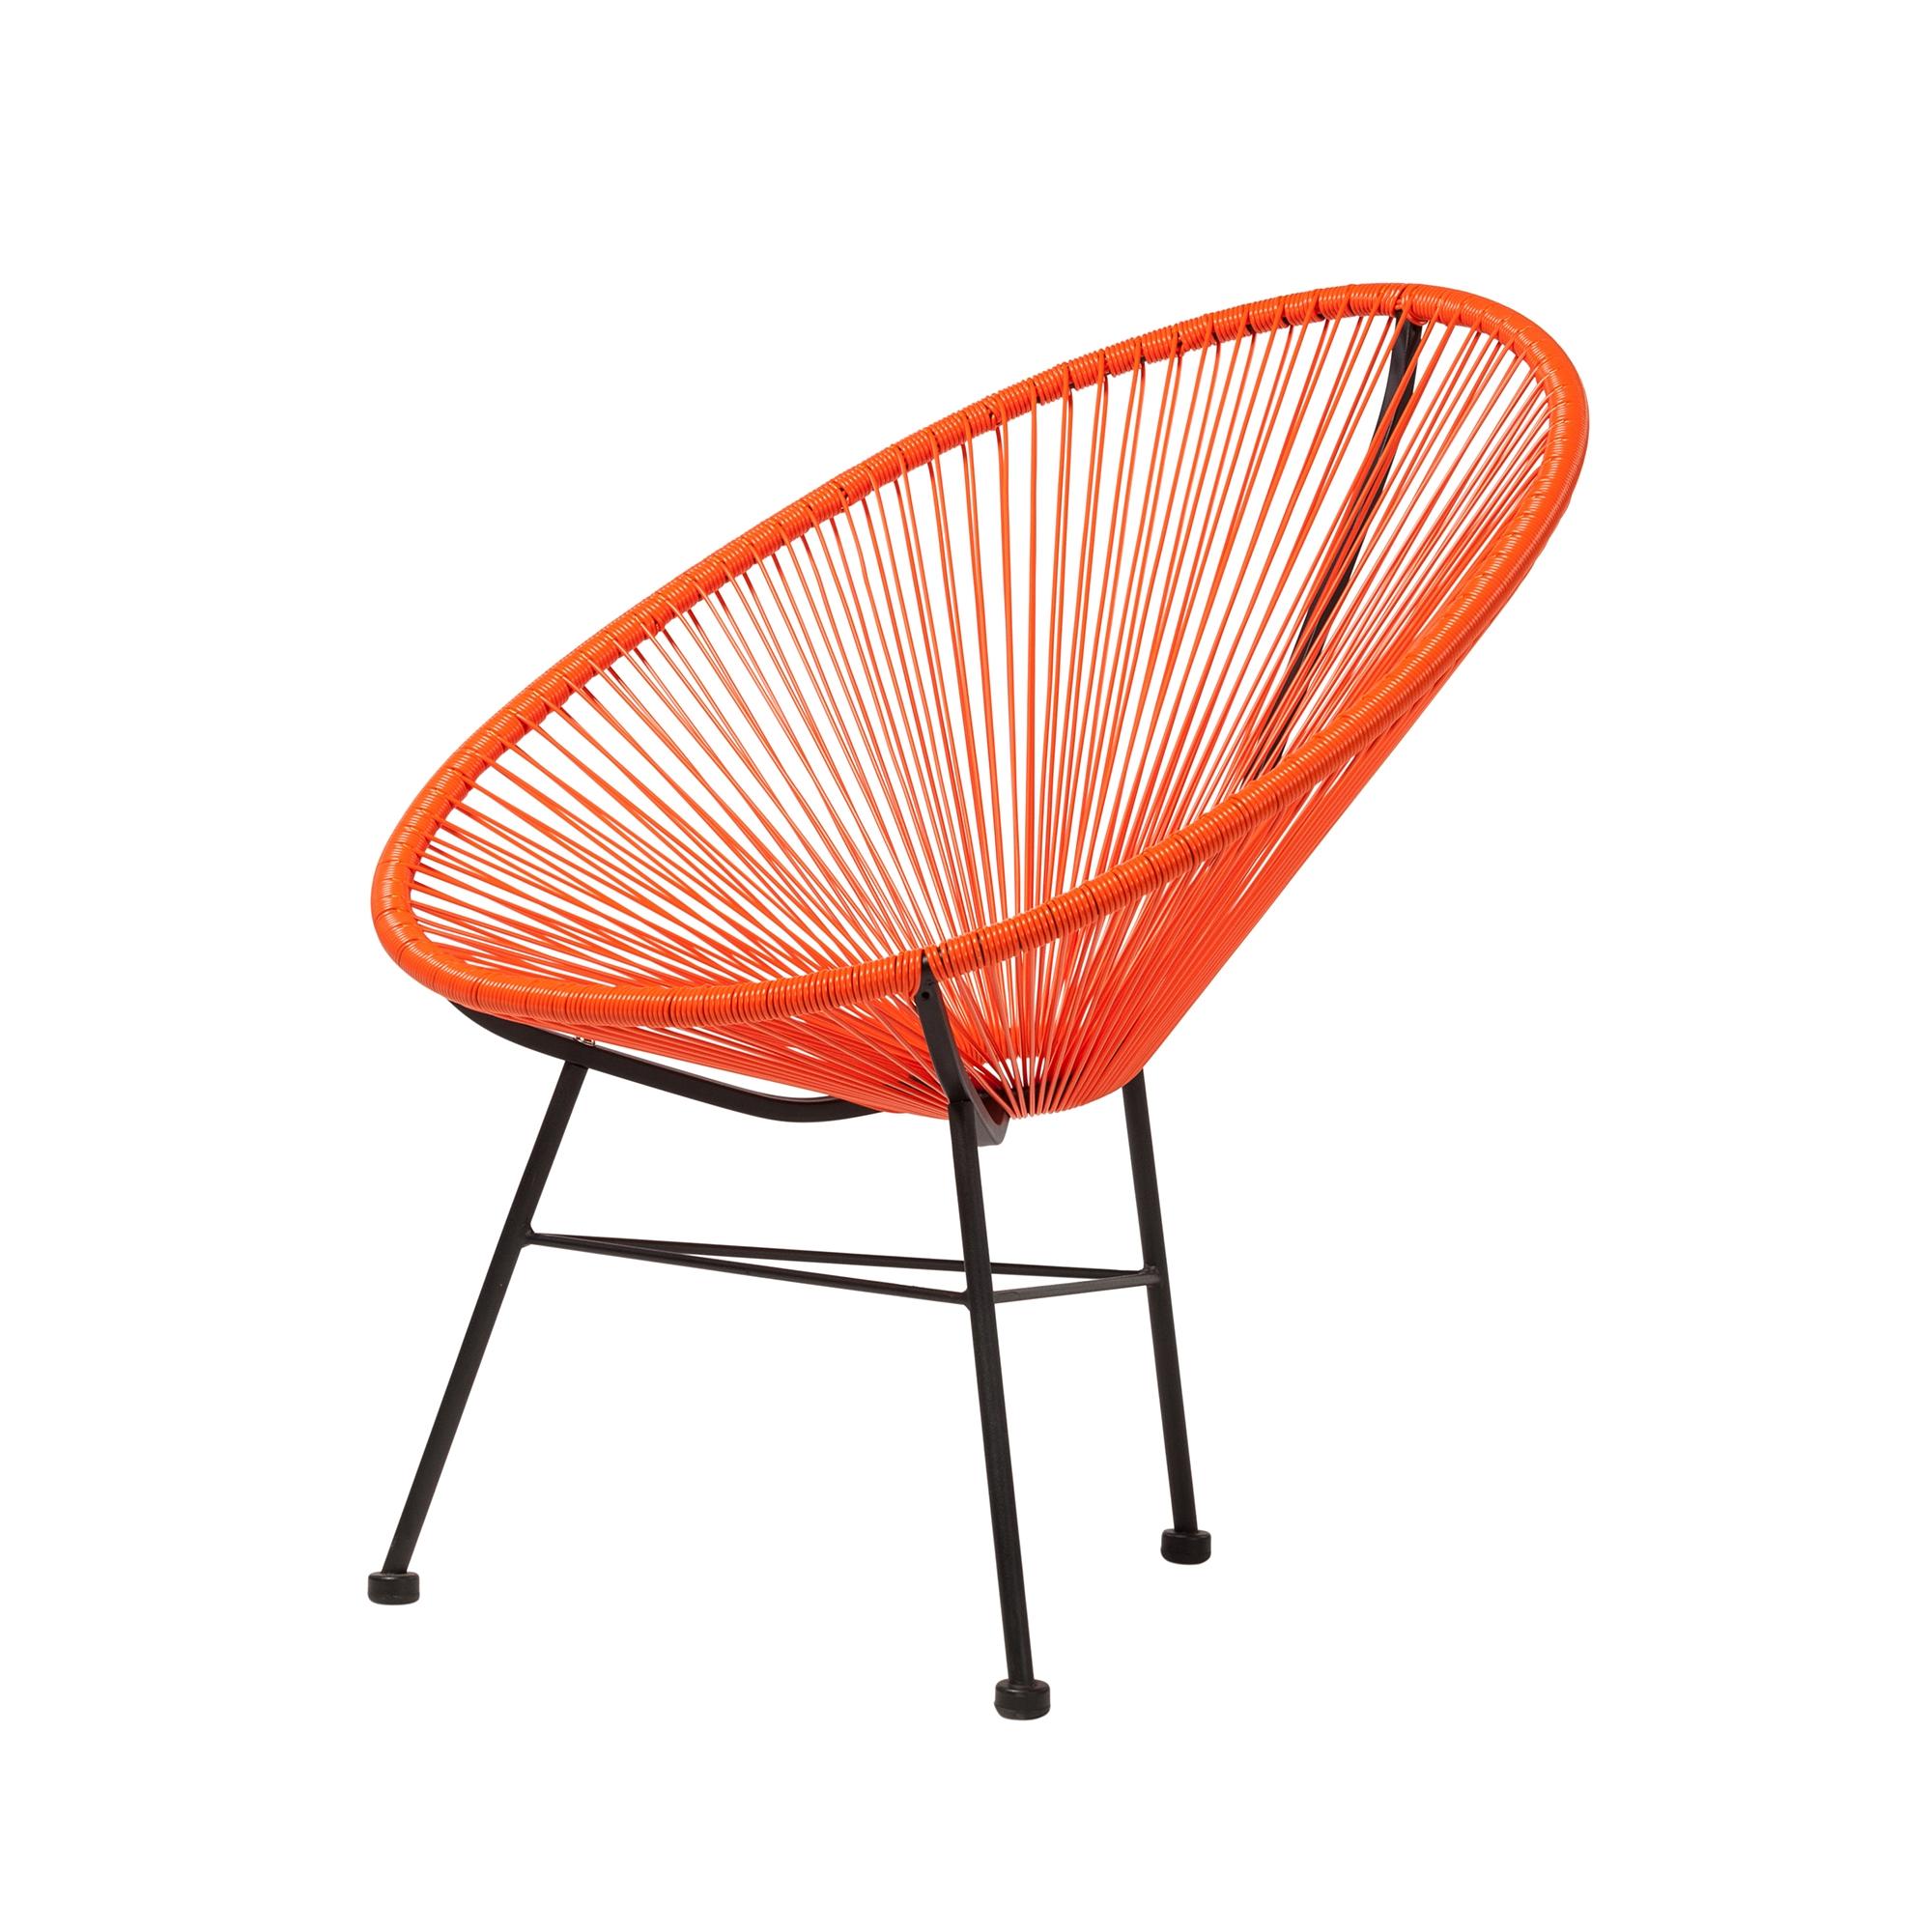 Lounge Stoel Retro.Acapulco Outdoor Lounge Chair Orange The Khazana Home